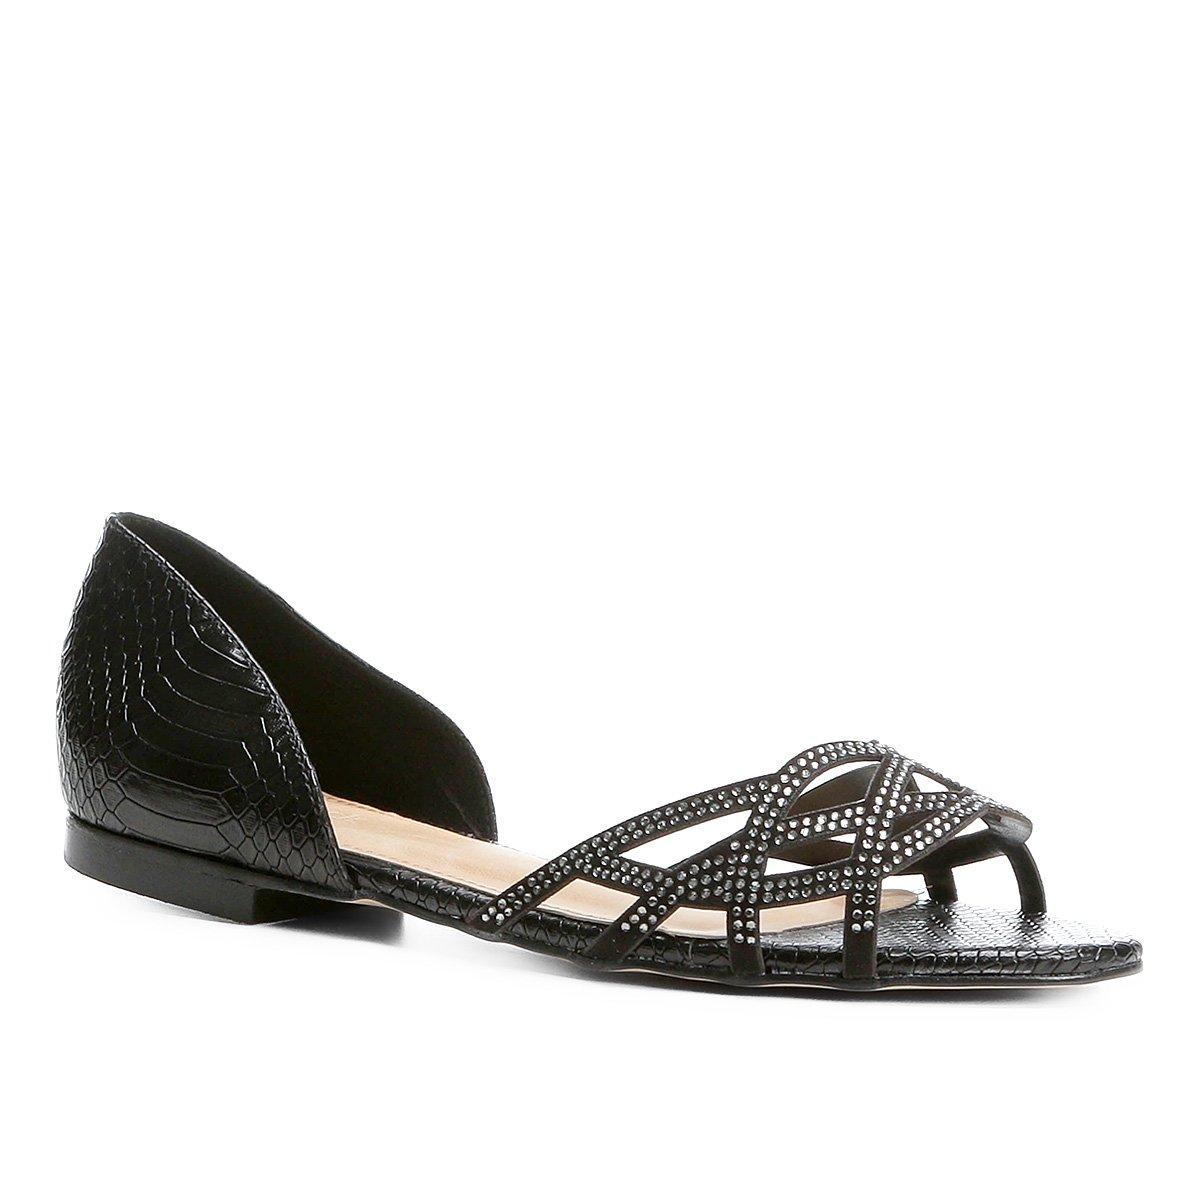 fe3bd5fec0 Sapatilha Shoestock Aberta Cristais Feminina - Compre Agora